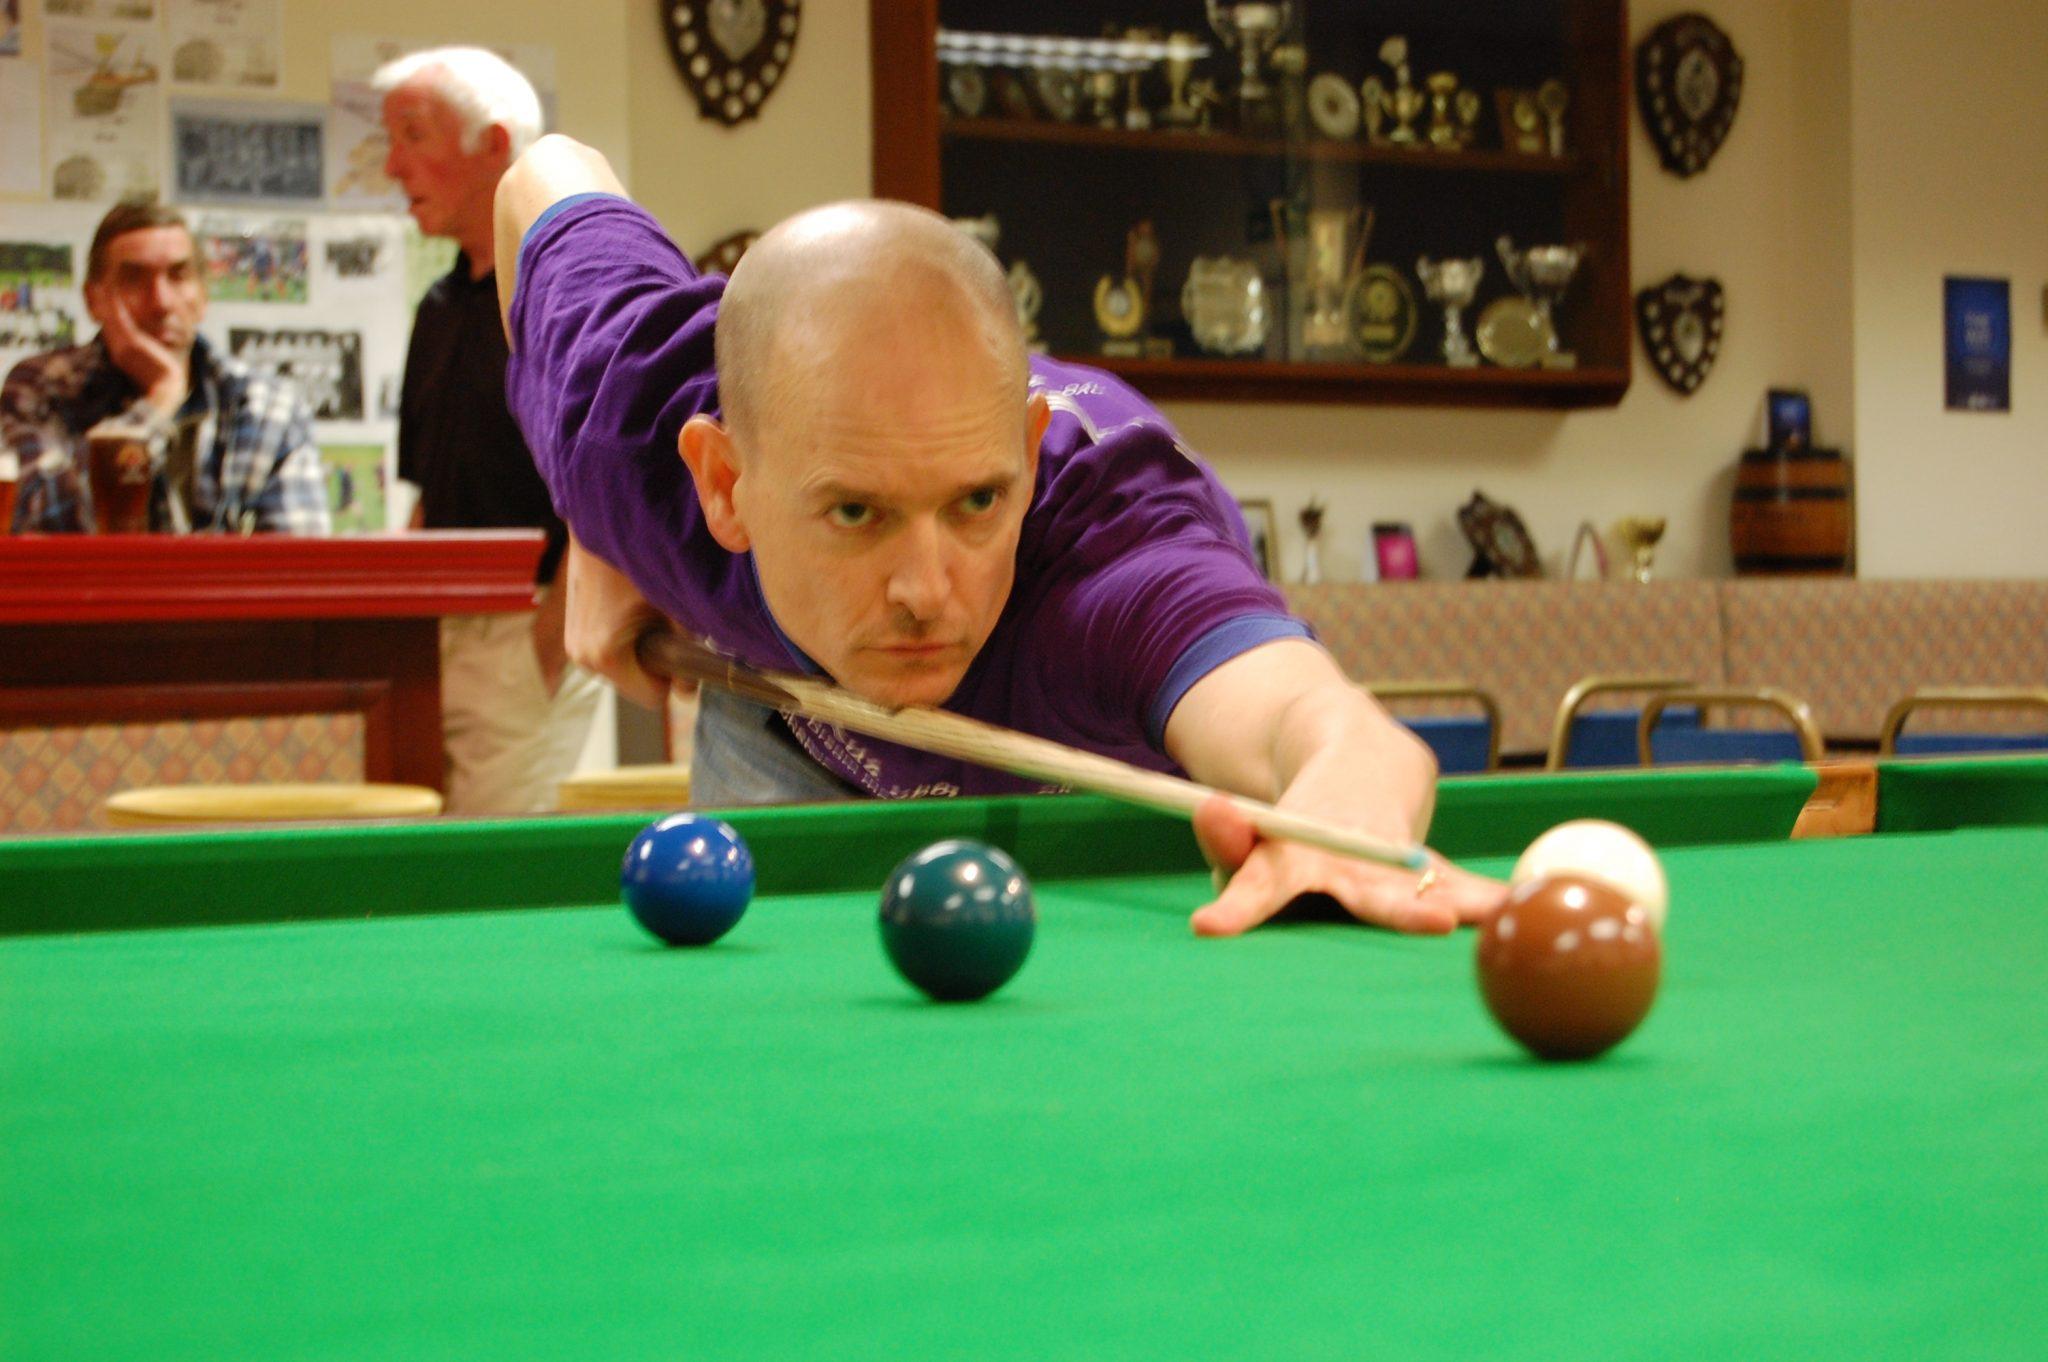 Jon draws level with win at Radcliffe Royal British Legion